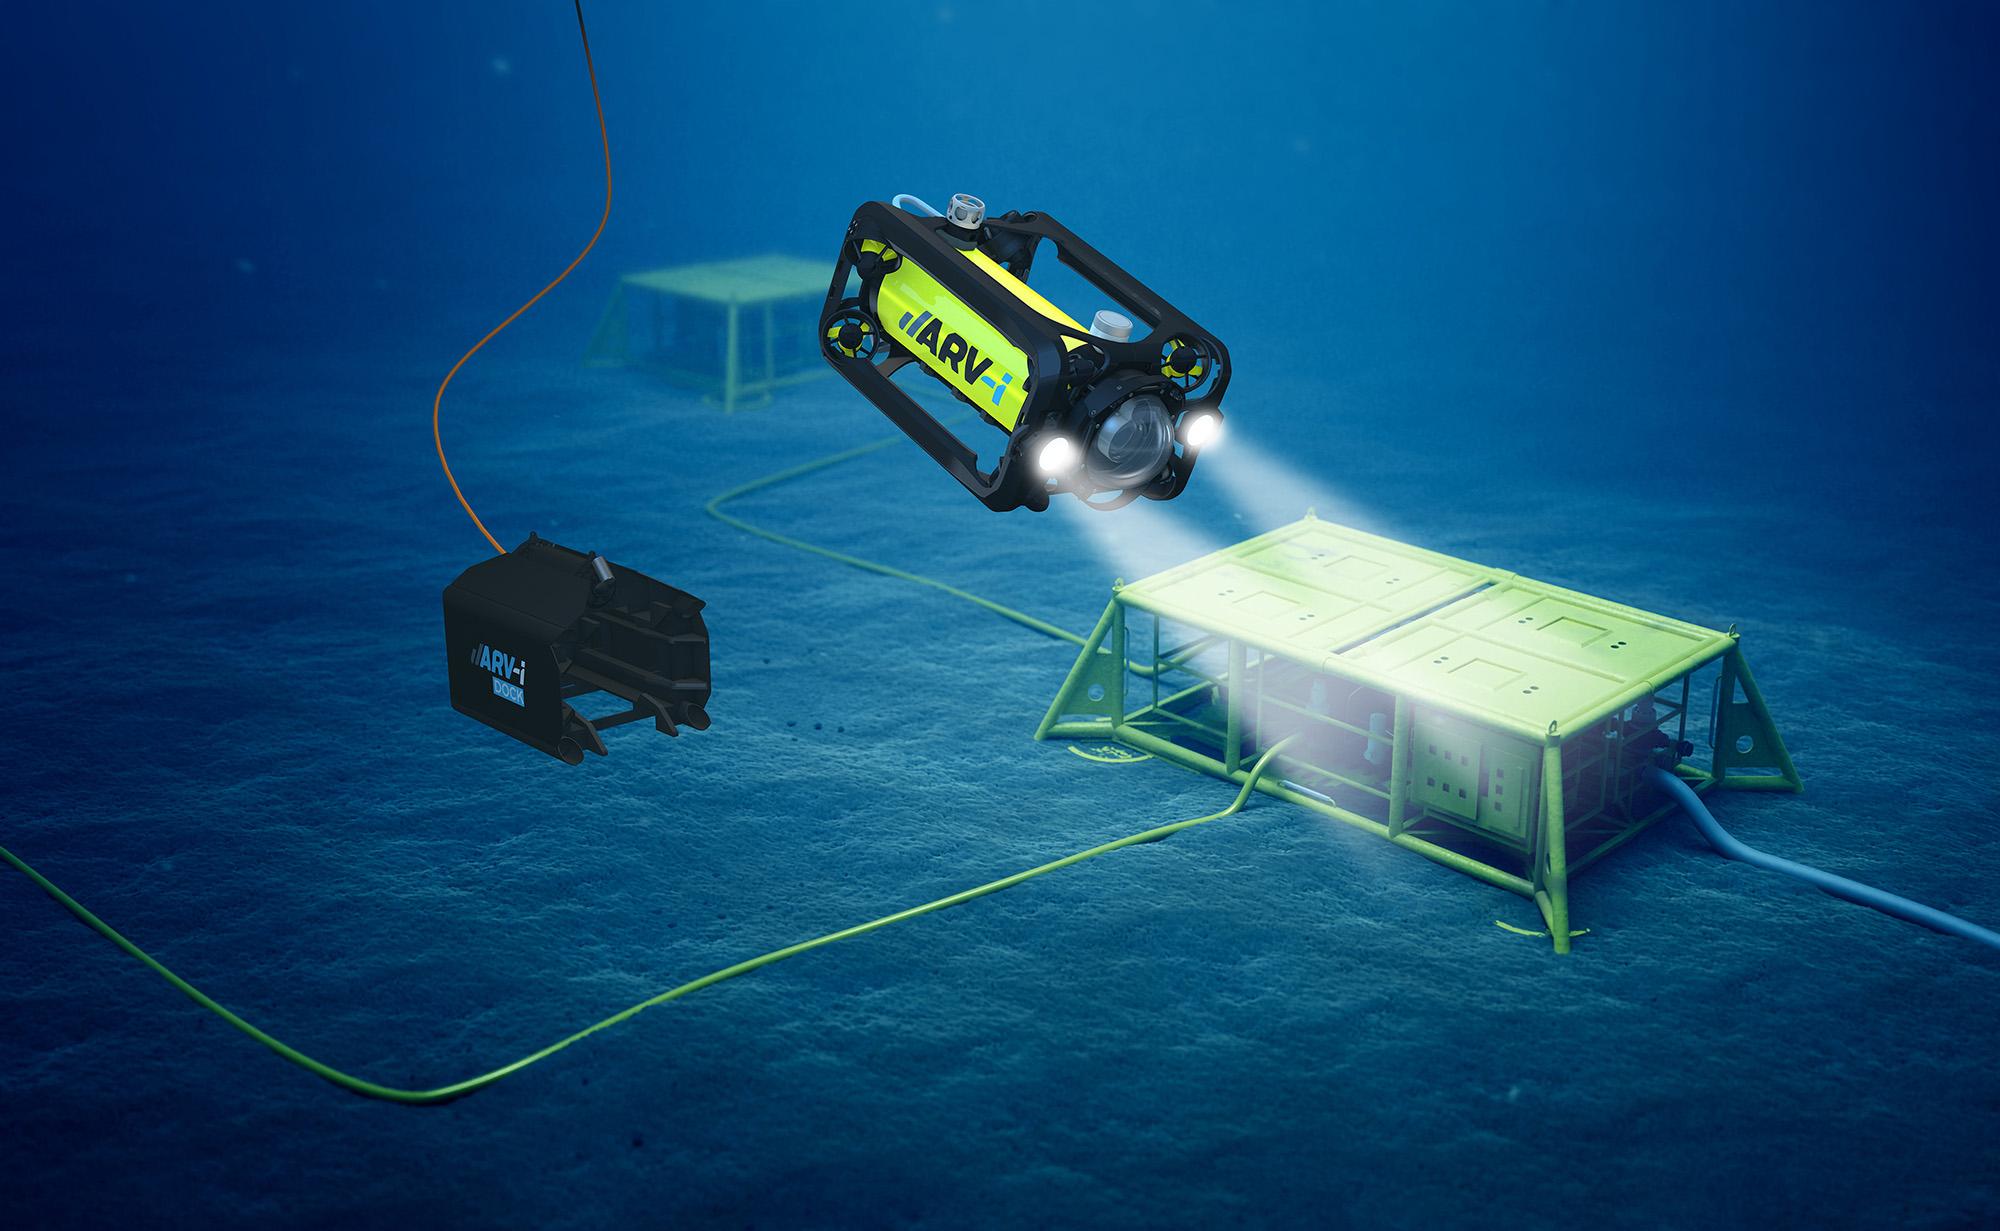 Render of the ARV-i in operation underwater